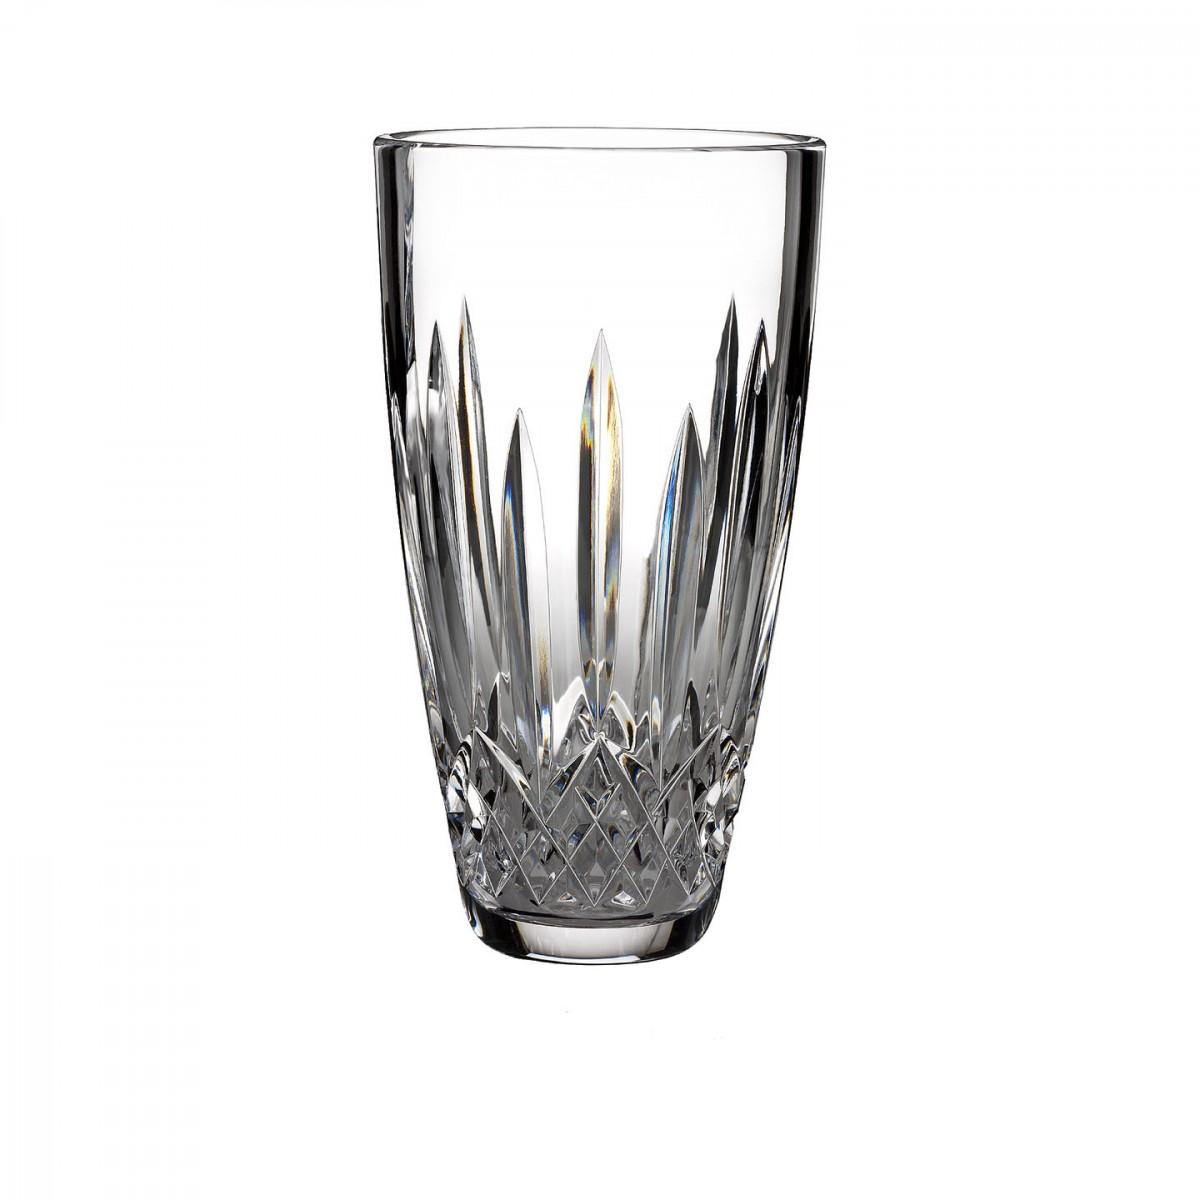 "Waterford Crystal, Lismore Classic 7"" Crystal Vase"